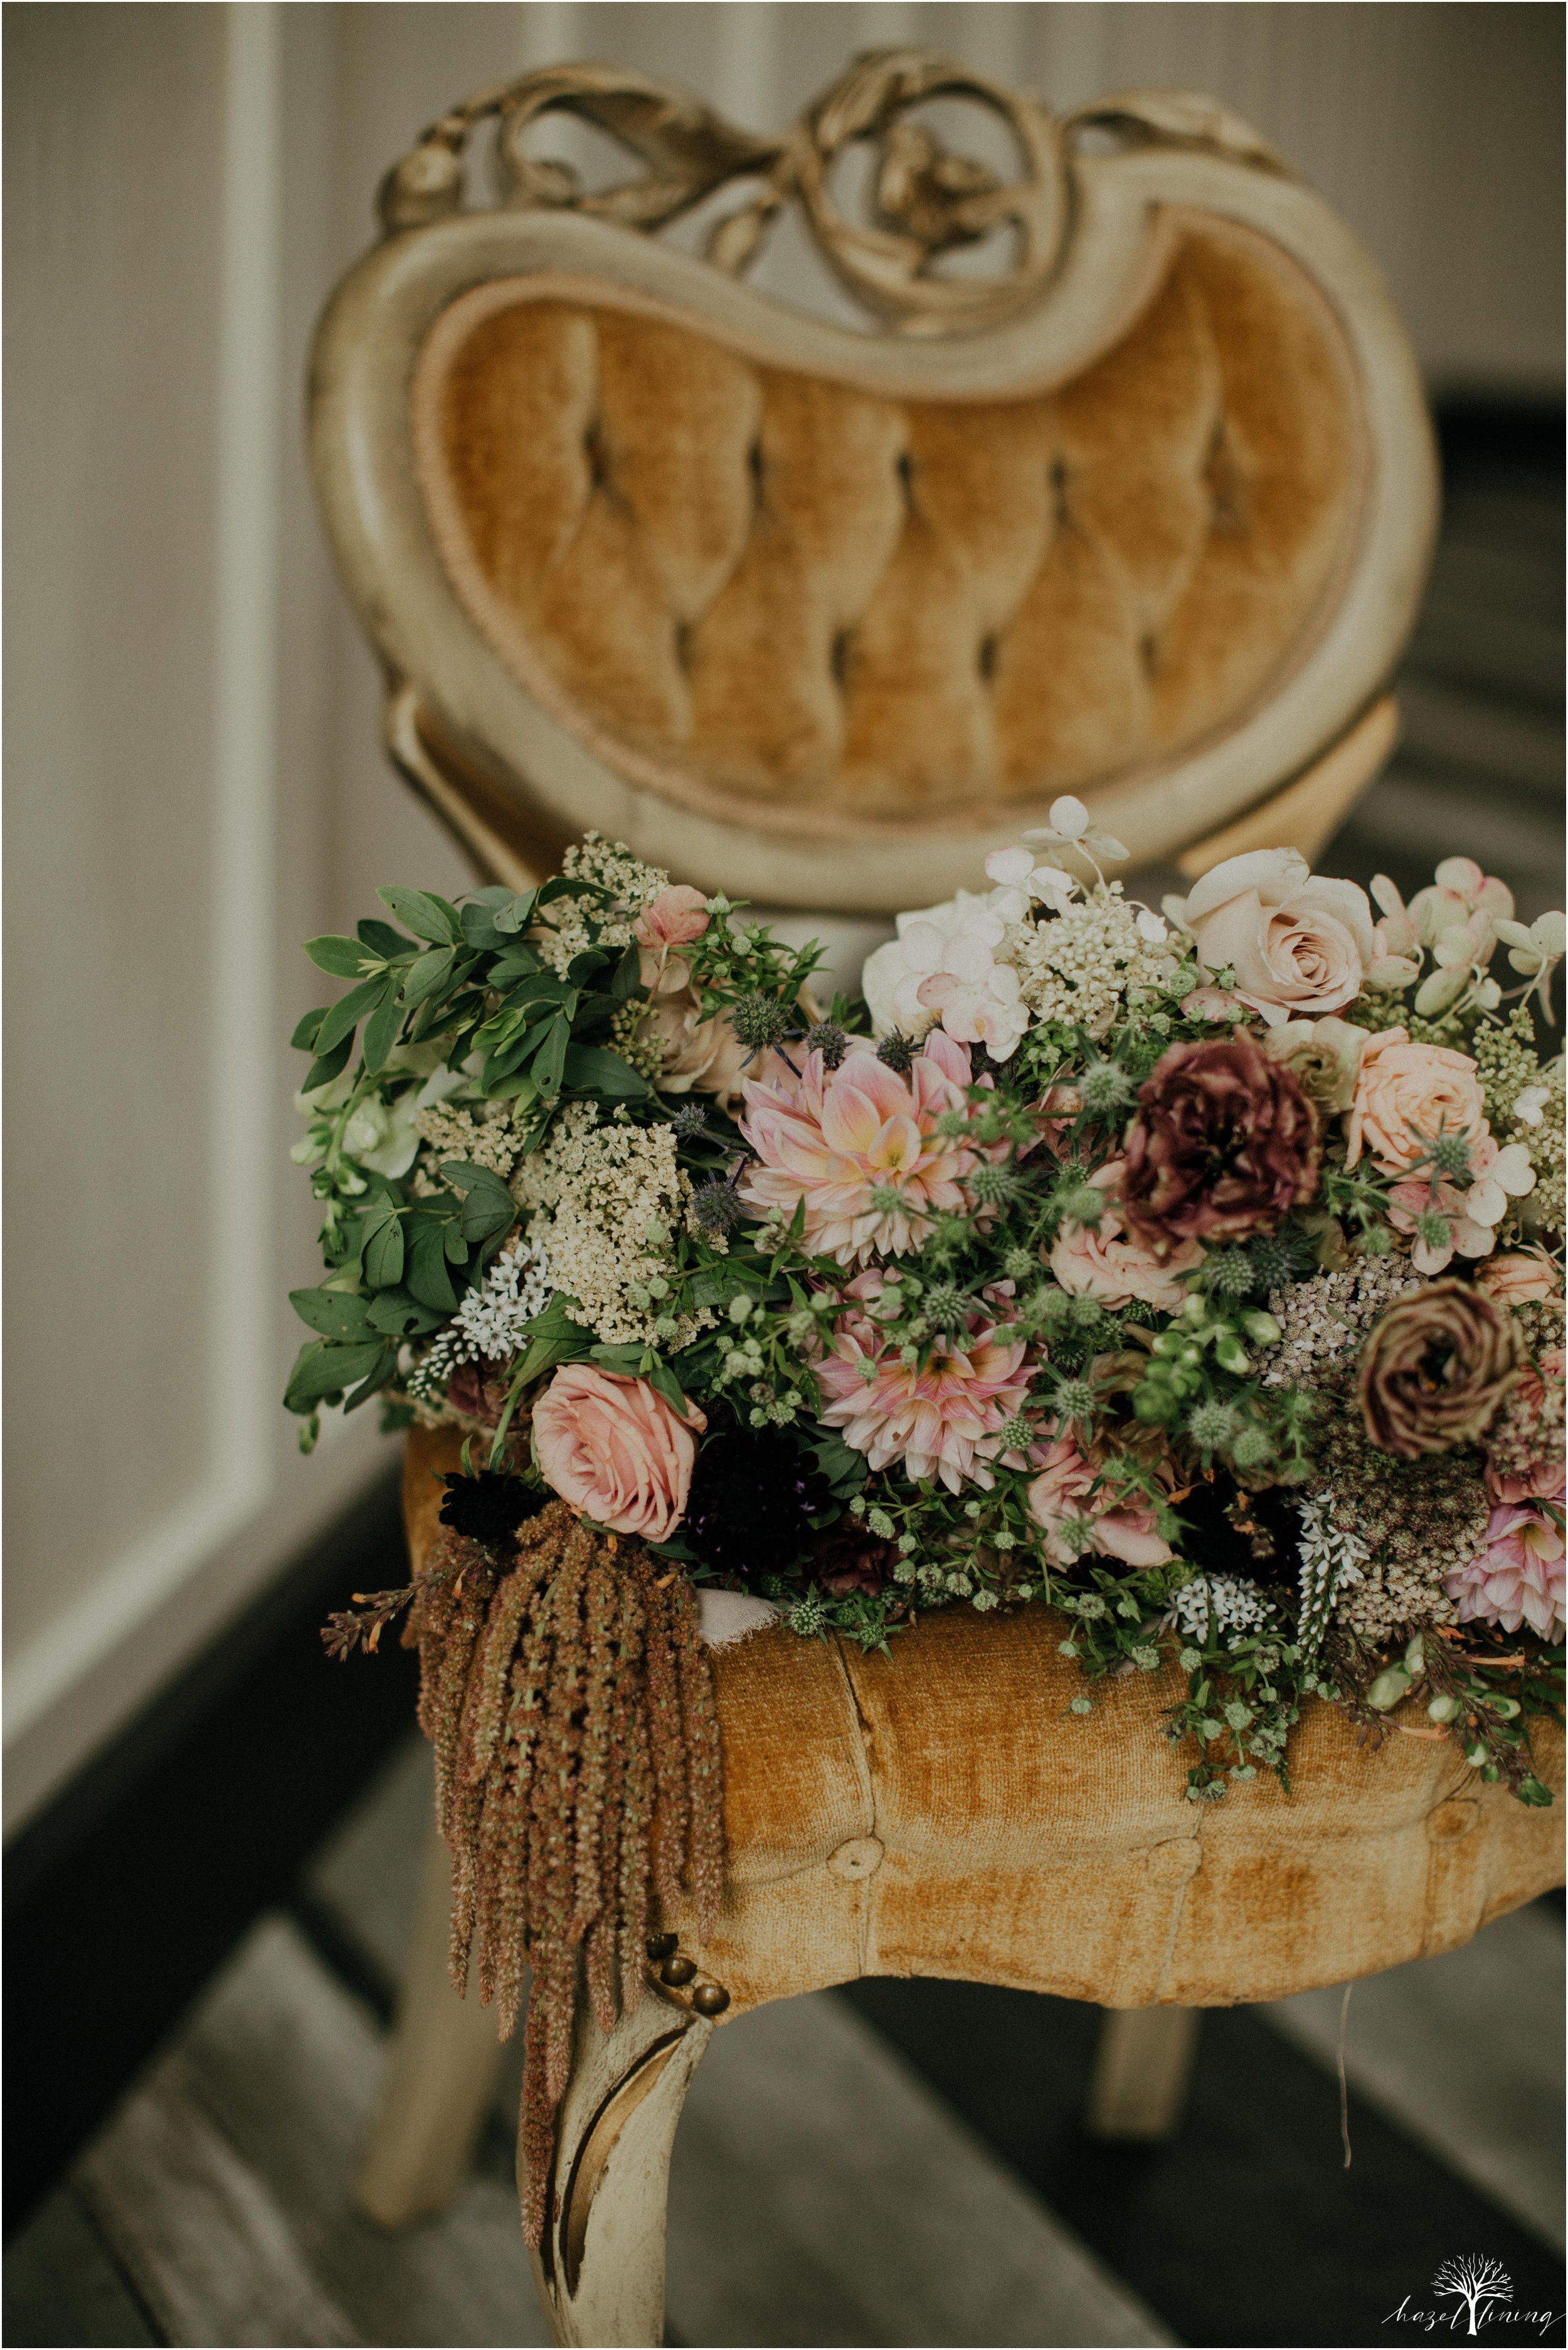 carl-chloe-the-ryland-inn-whitehouse-station-new-jersey-styled-squad-hazel-lining-photography-destination-elopement-wedding-engagement-photography_0014.jpg